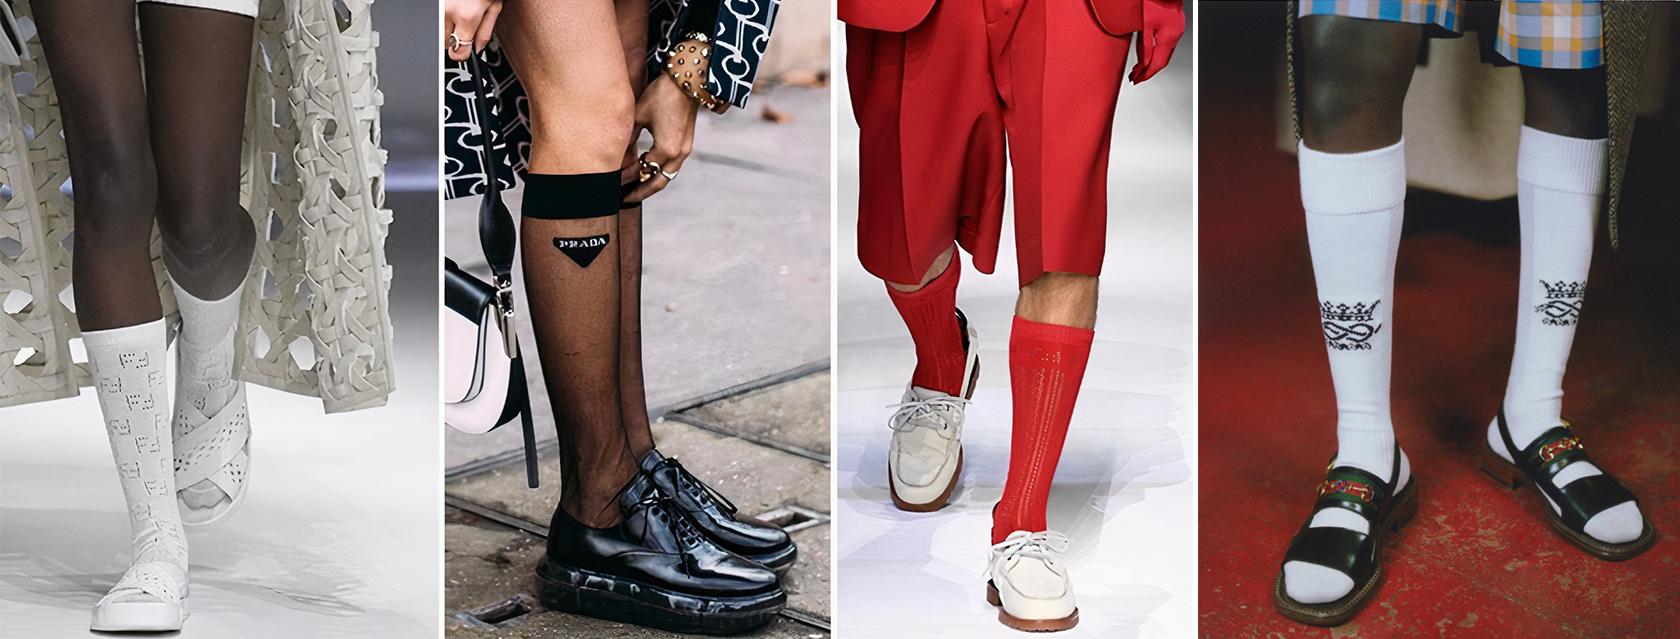 Sandalias-Calcetines-Celine-Prada-Gucci-MagazineHorse